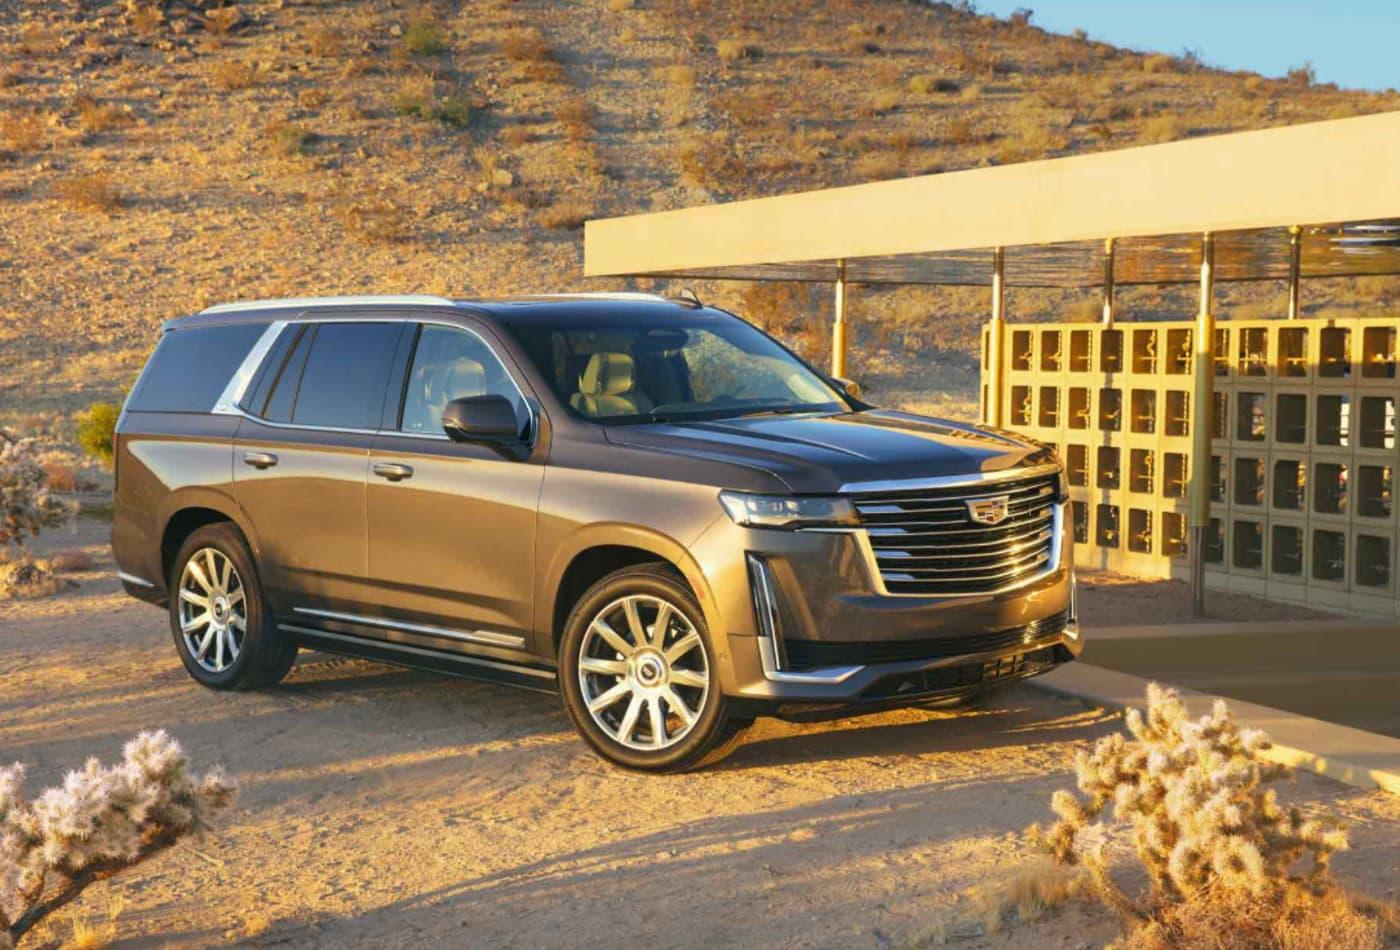 GM unveils new tech-savvy Cadillac Escalade SUV